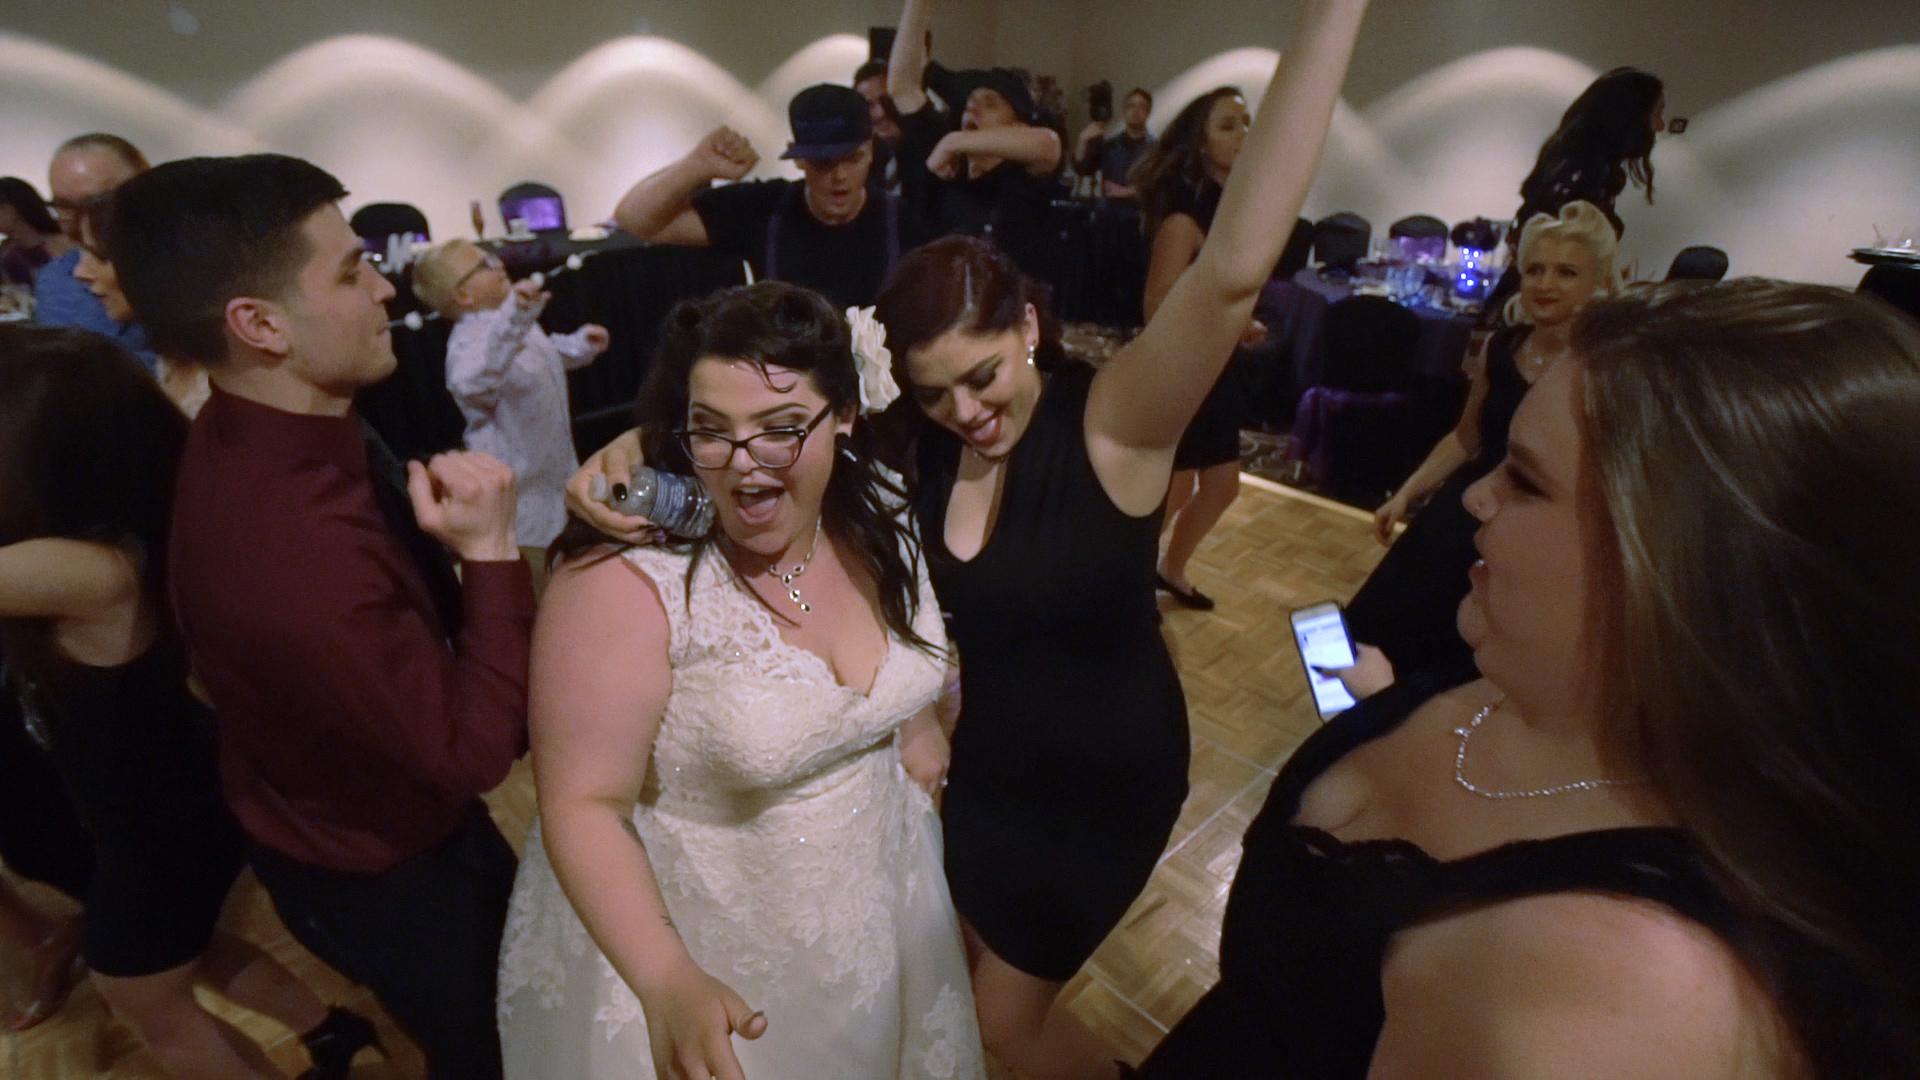 Dariana Anthony Wedding 2018 RECEPTION.01_32_36_12.Still065.jpg